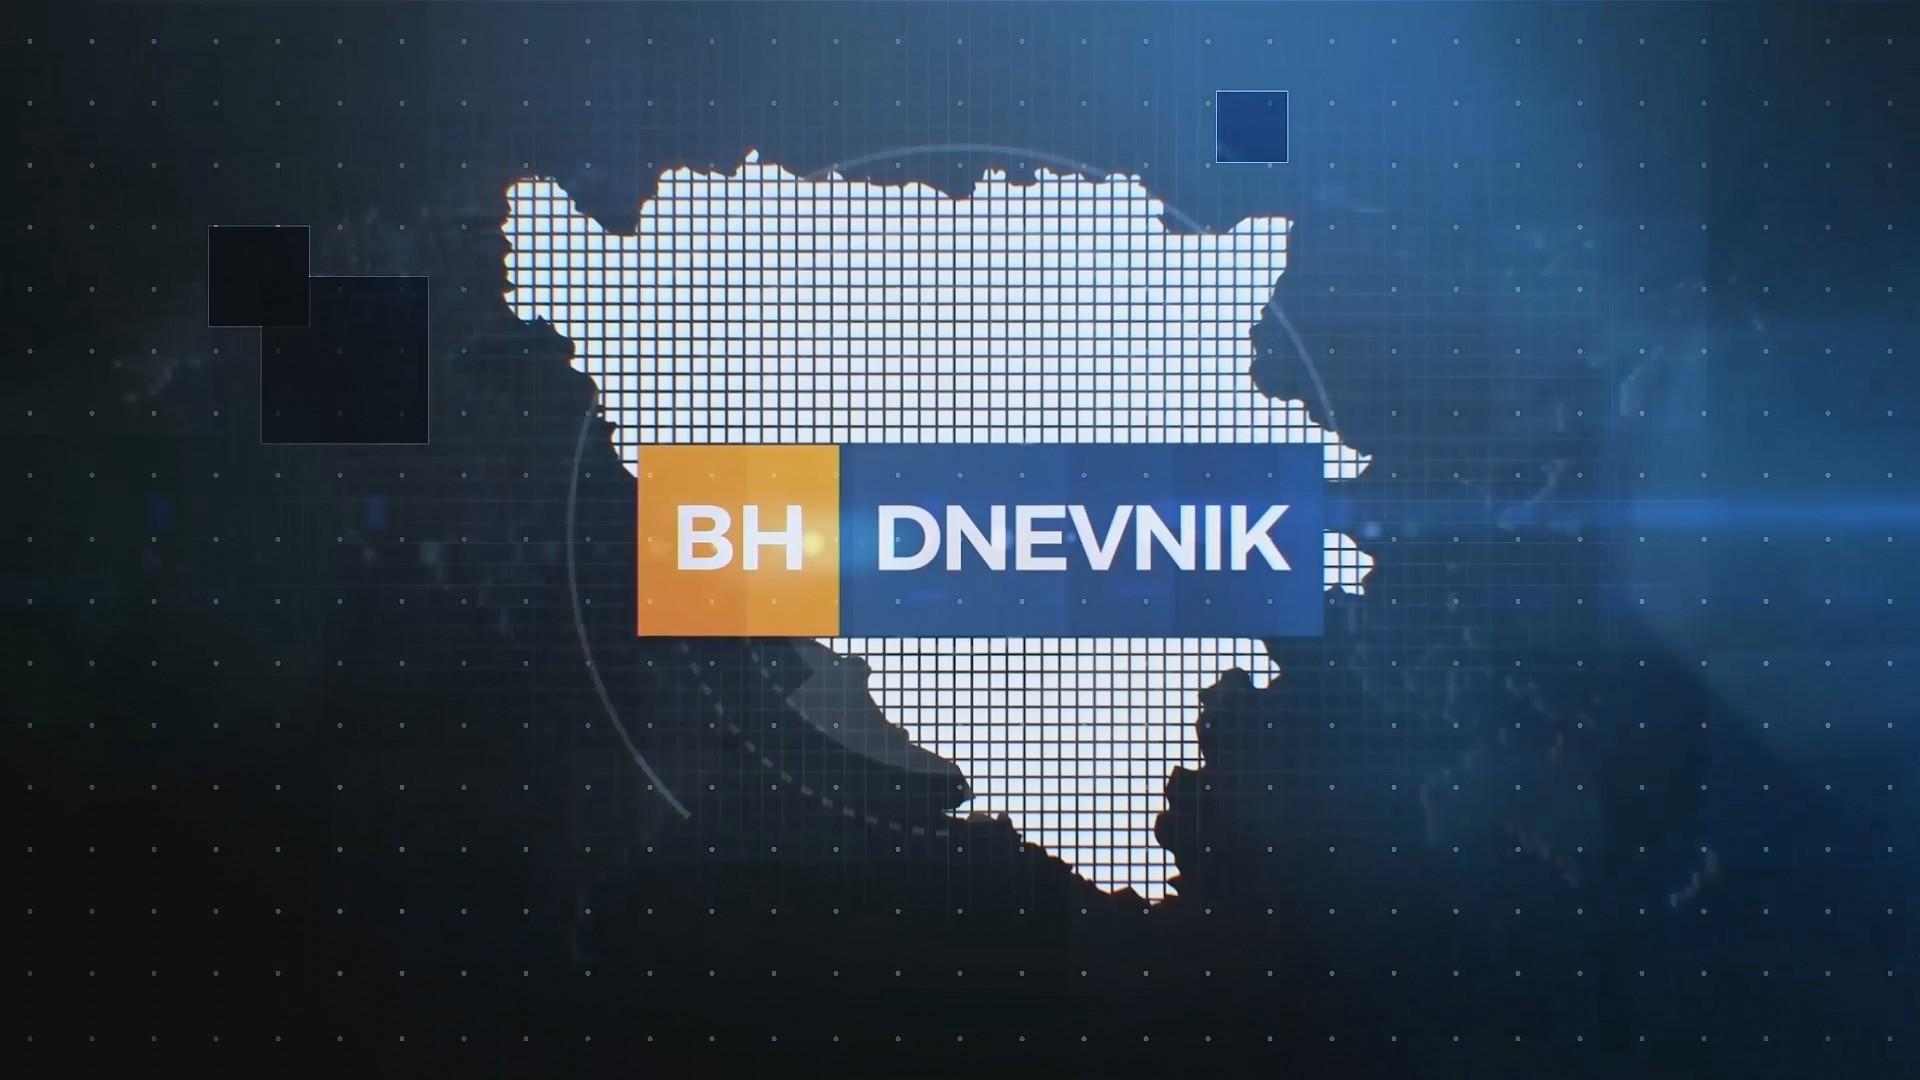 BH DNEVNIK, informativni program